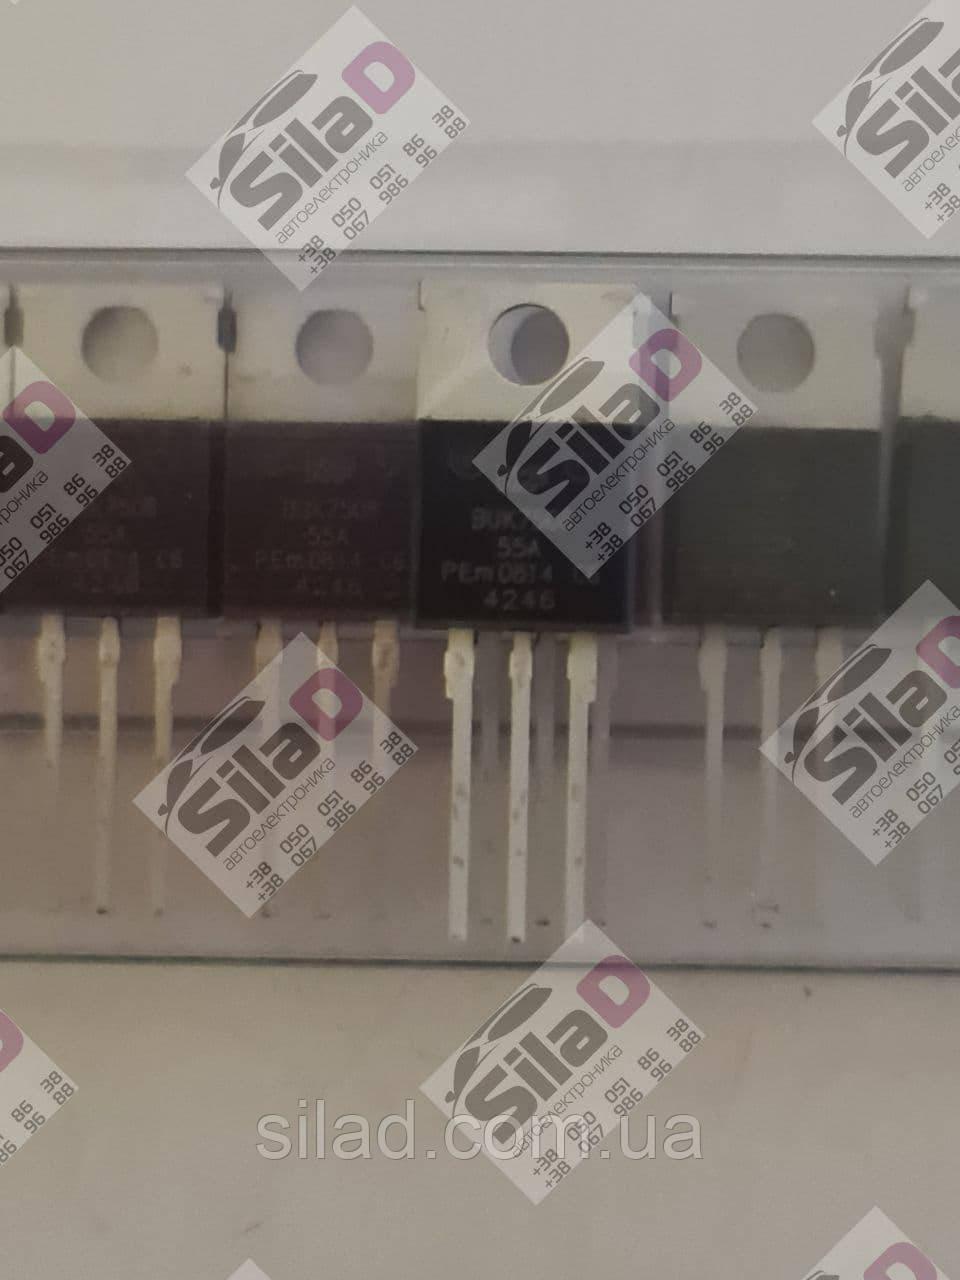 Транзистор BUK7508-55A NXP корпус TO-220AB